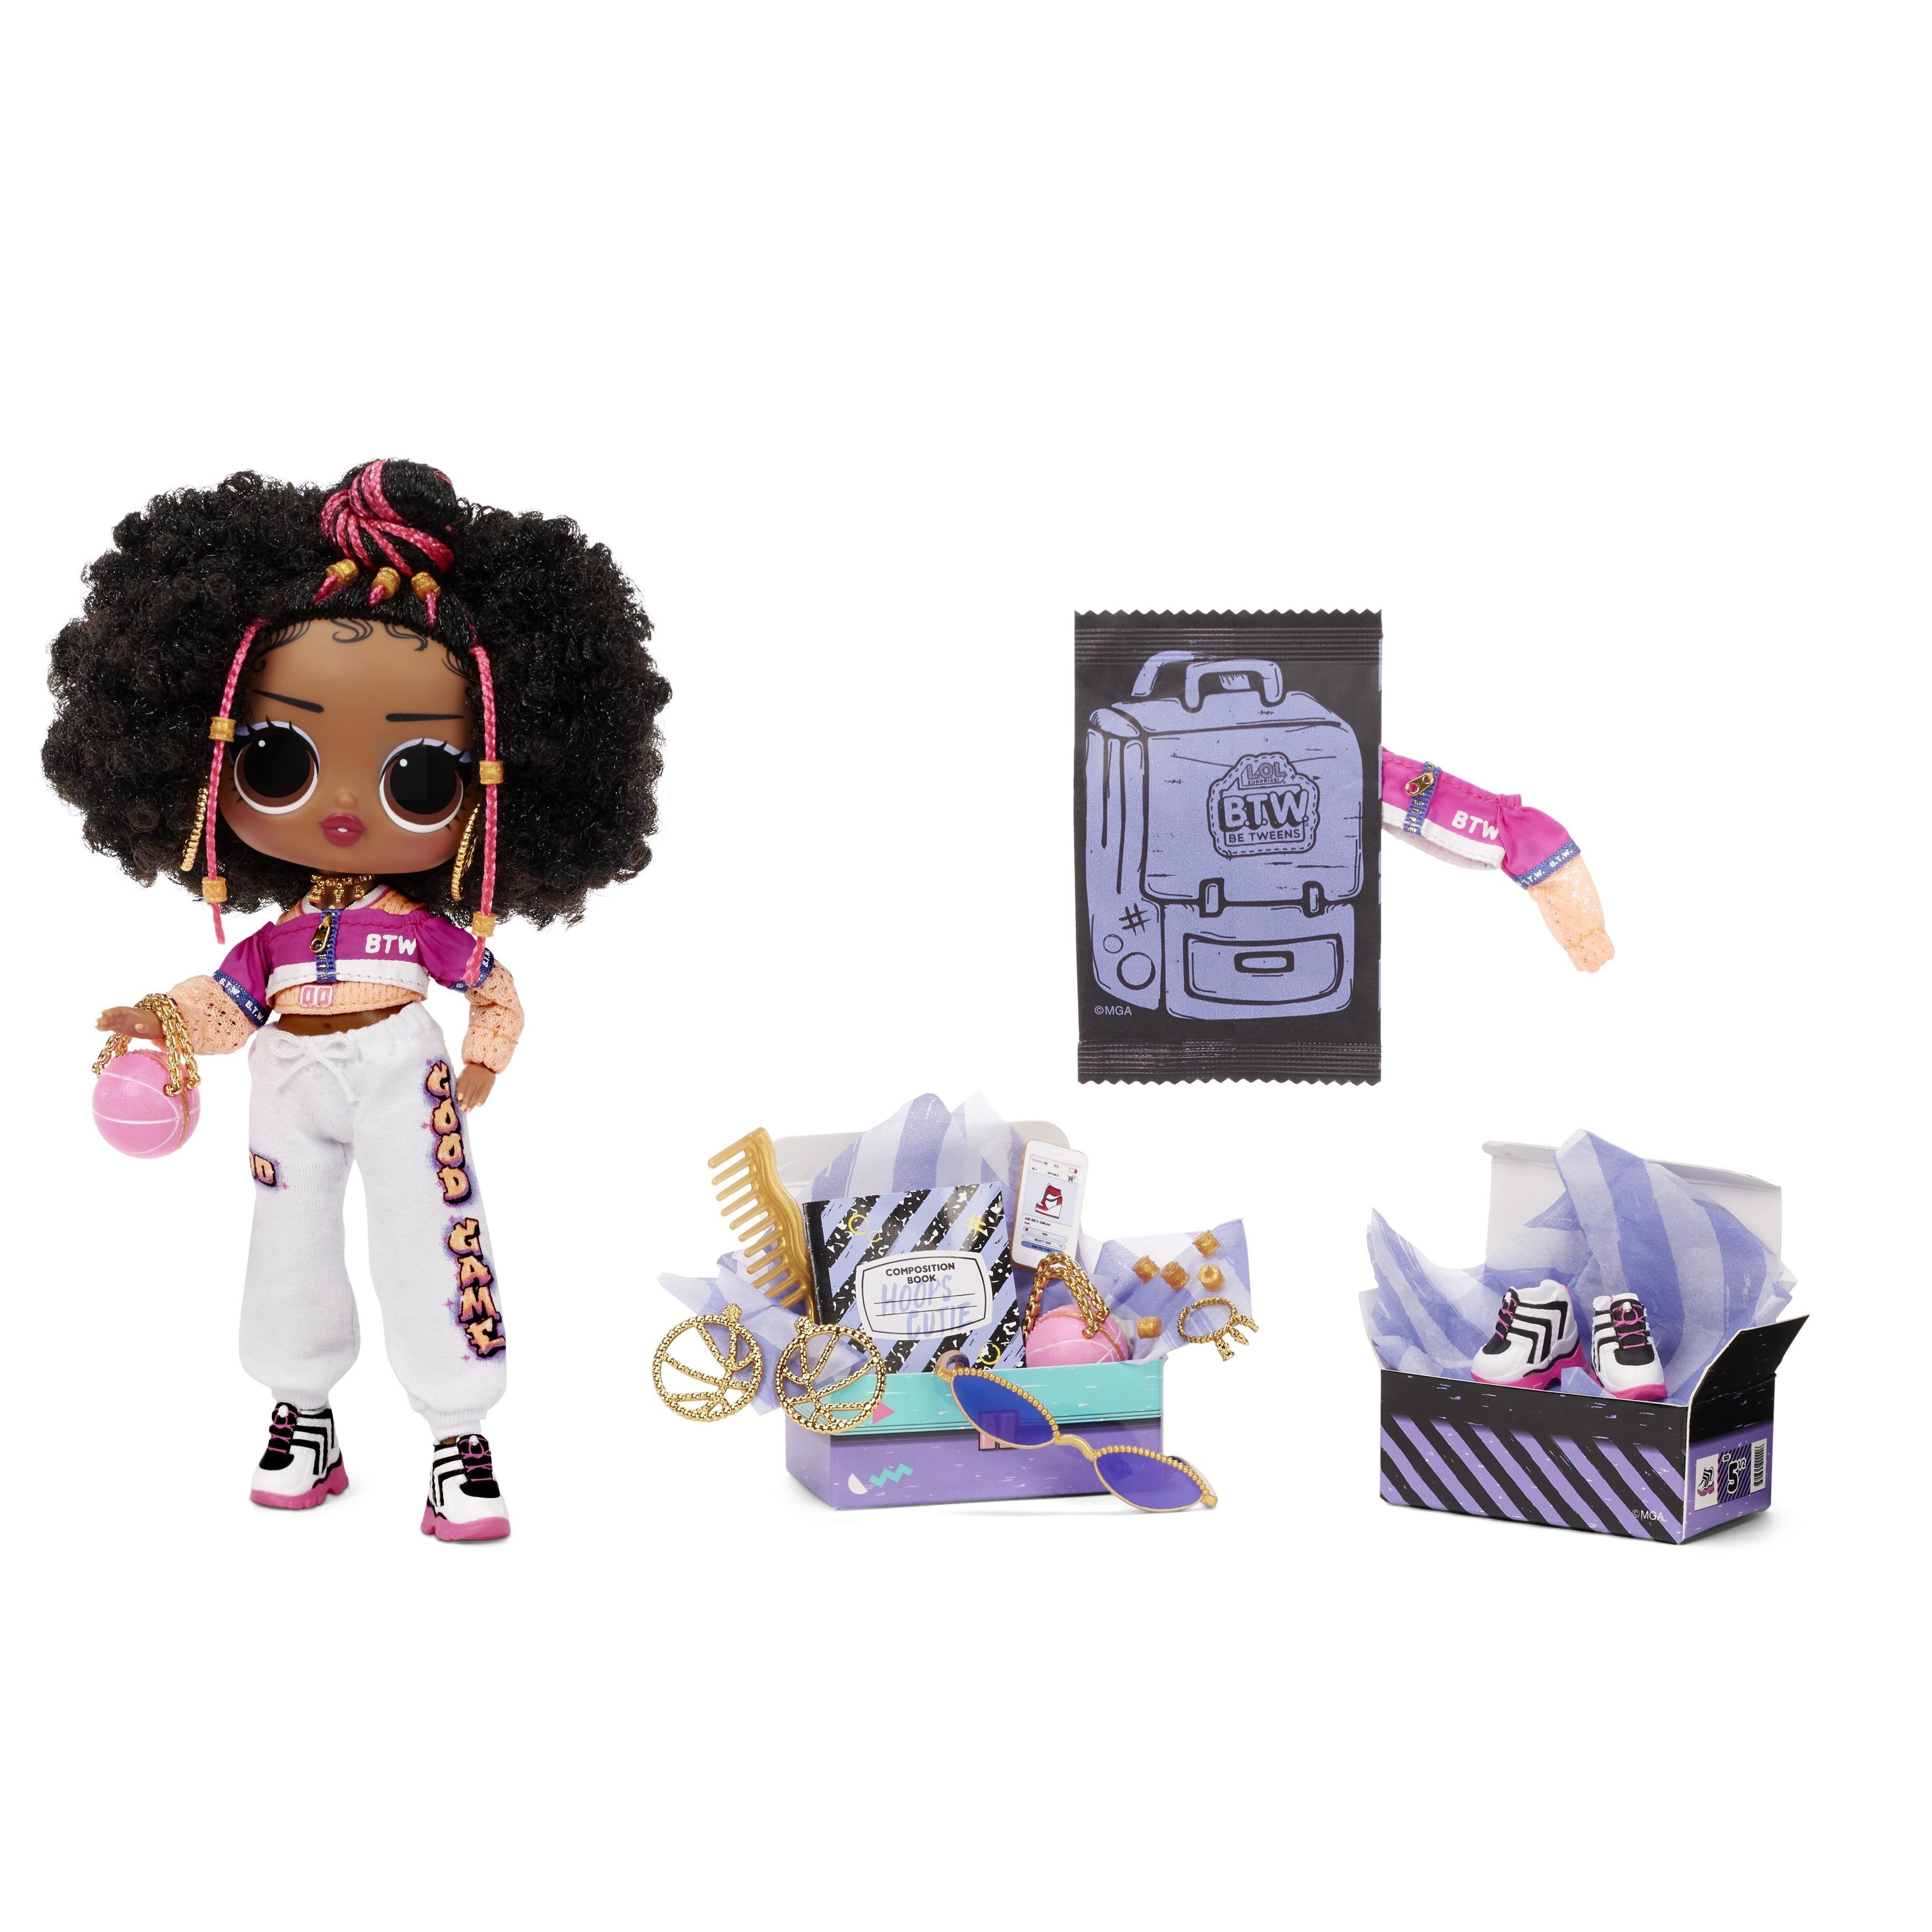 L.O.L. Surprise - BTW Doll- Fresh (576693)